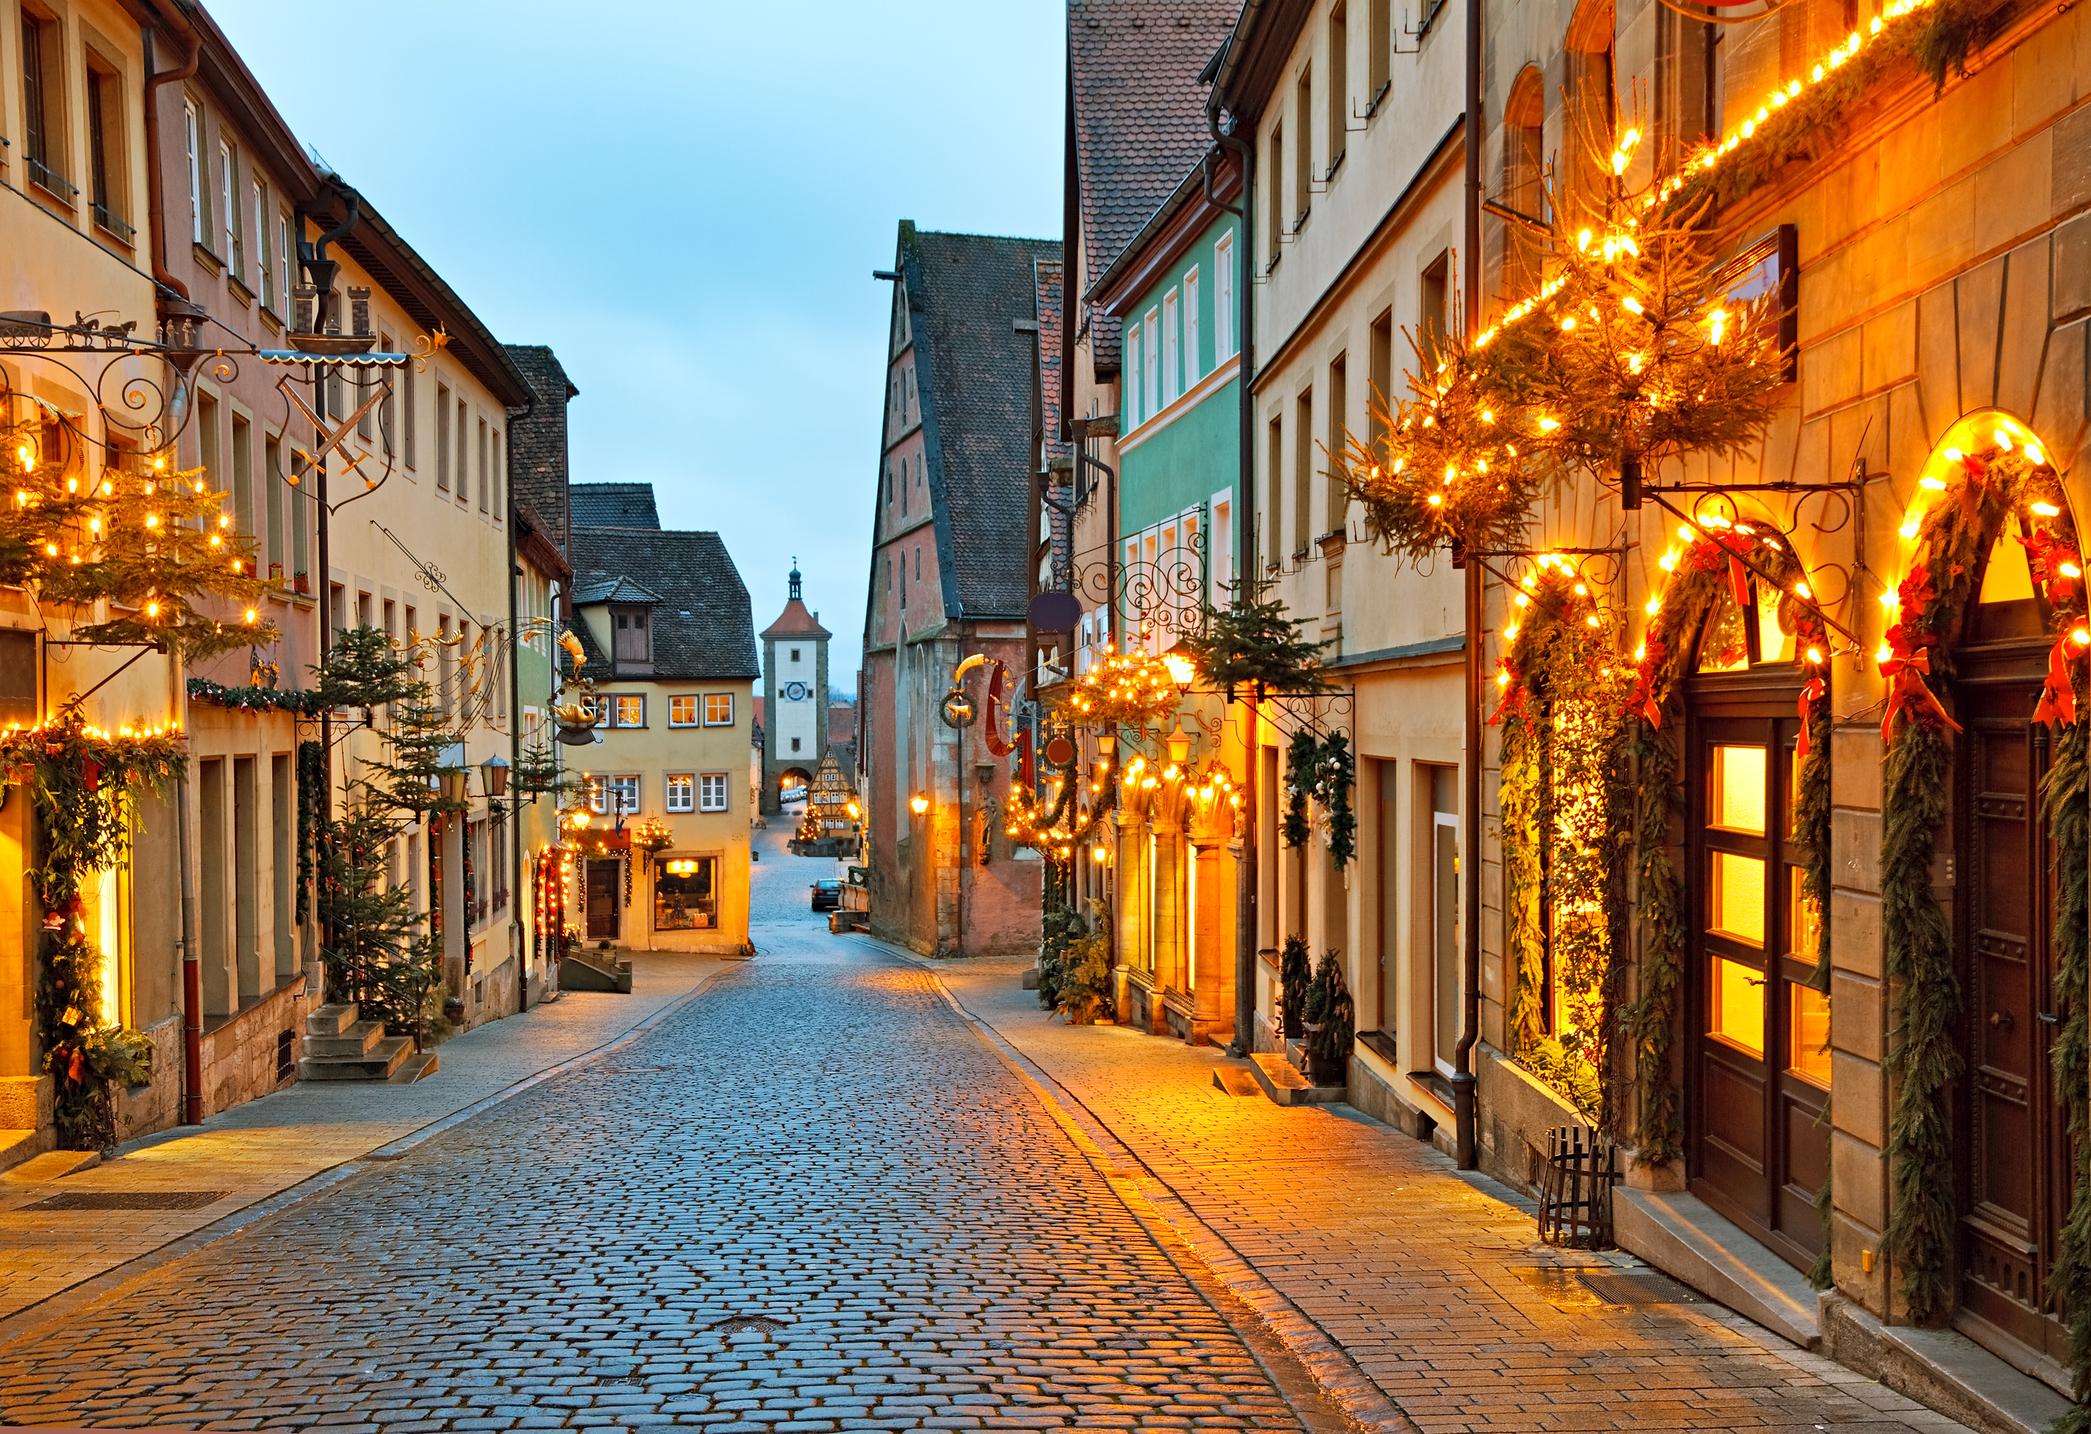 Rothenburg-charming-Bavariana-town.jpg?mtime=20190228120433#asset:105025